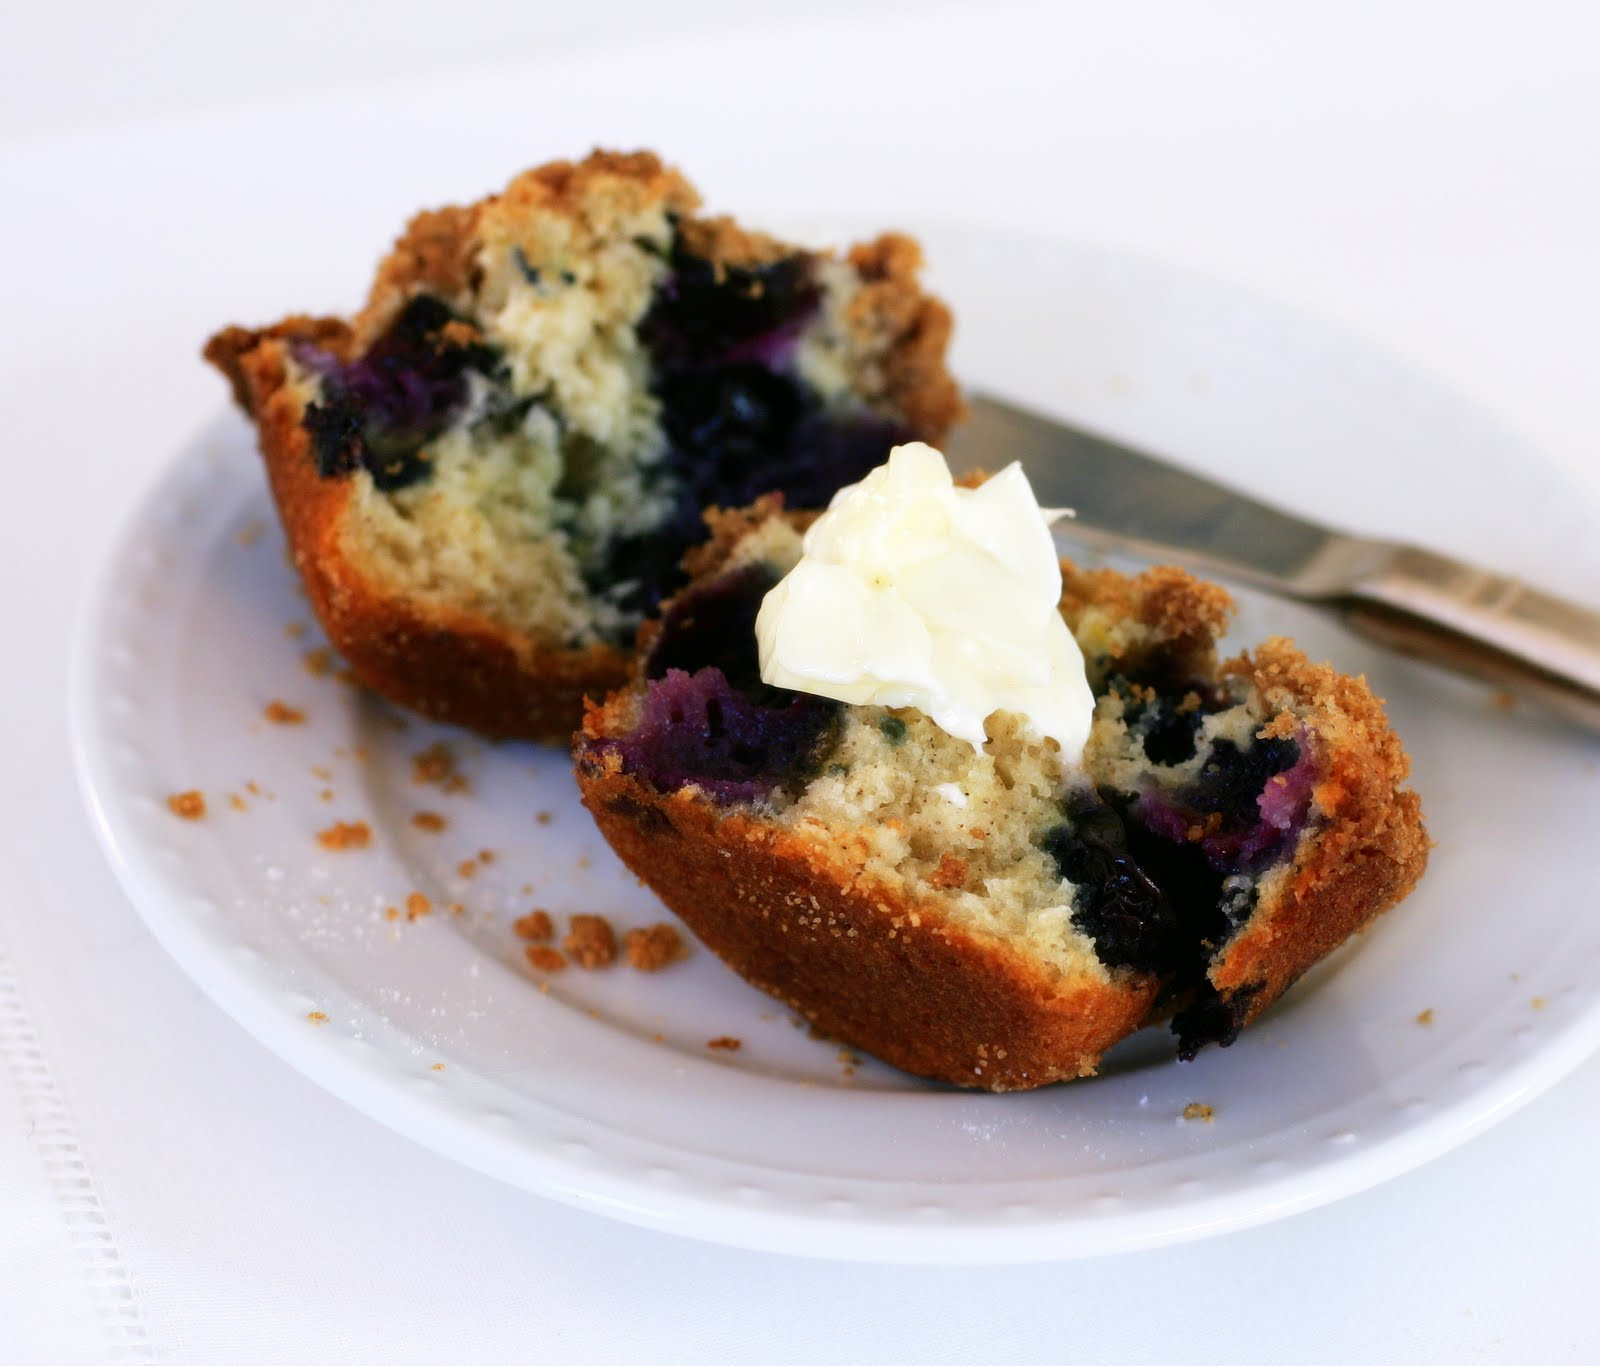 Tish Boyle Sweet Dreams: Blueberry Lemon Buttermilk Muffins